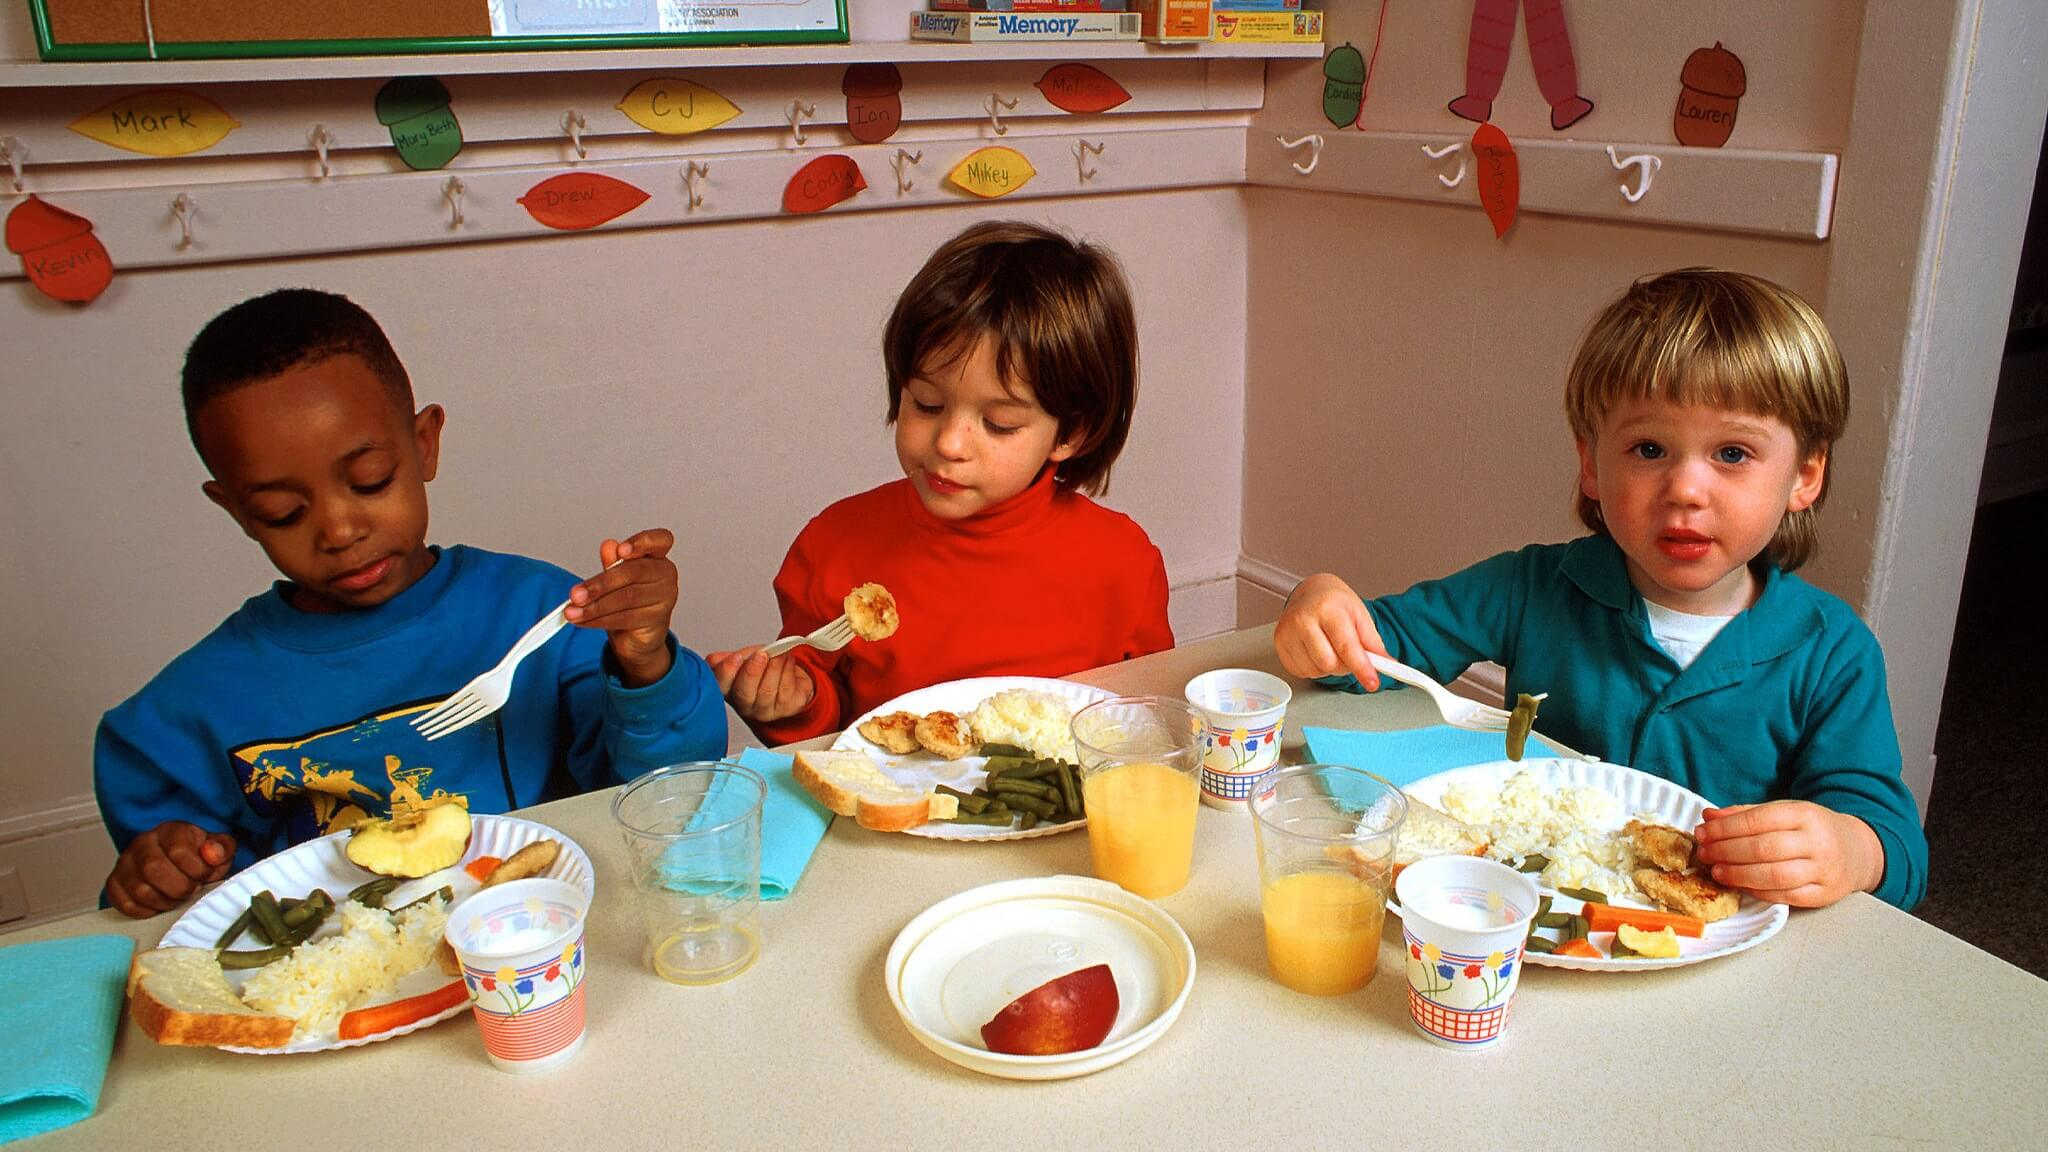 International Non-Profit Brings Vegan Meals to Schools to Combat Childhood Obesity